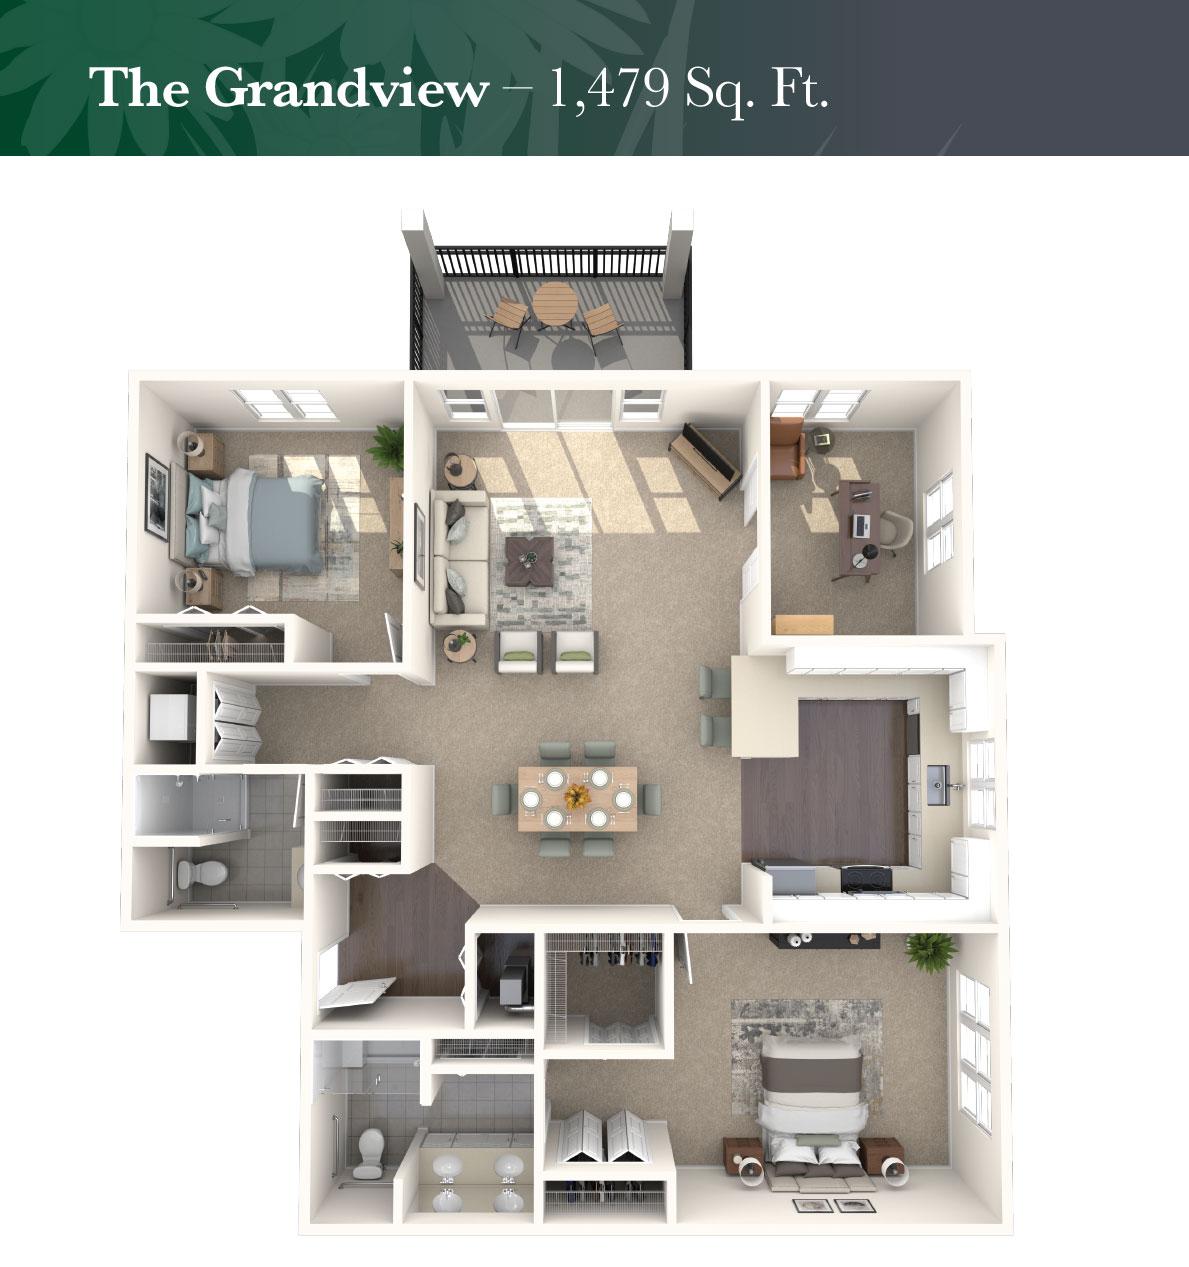 The Grandview Rendering